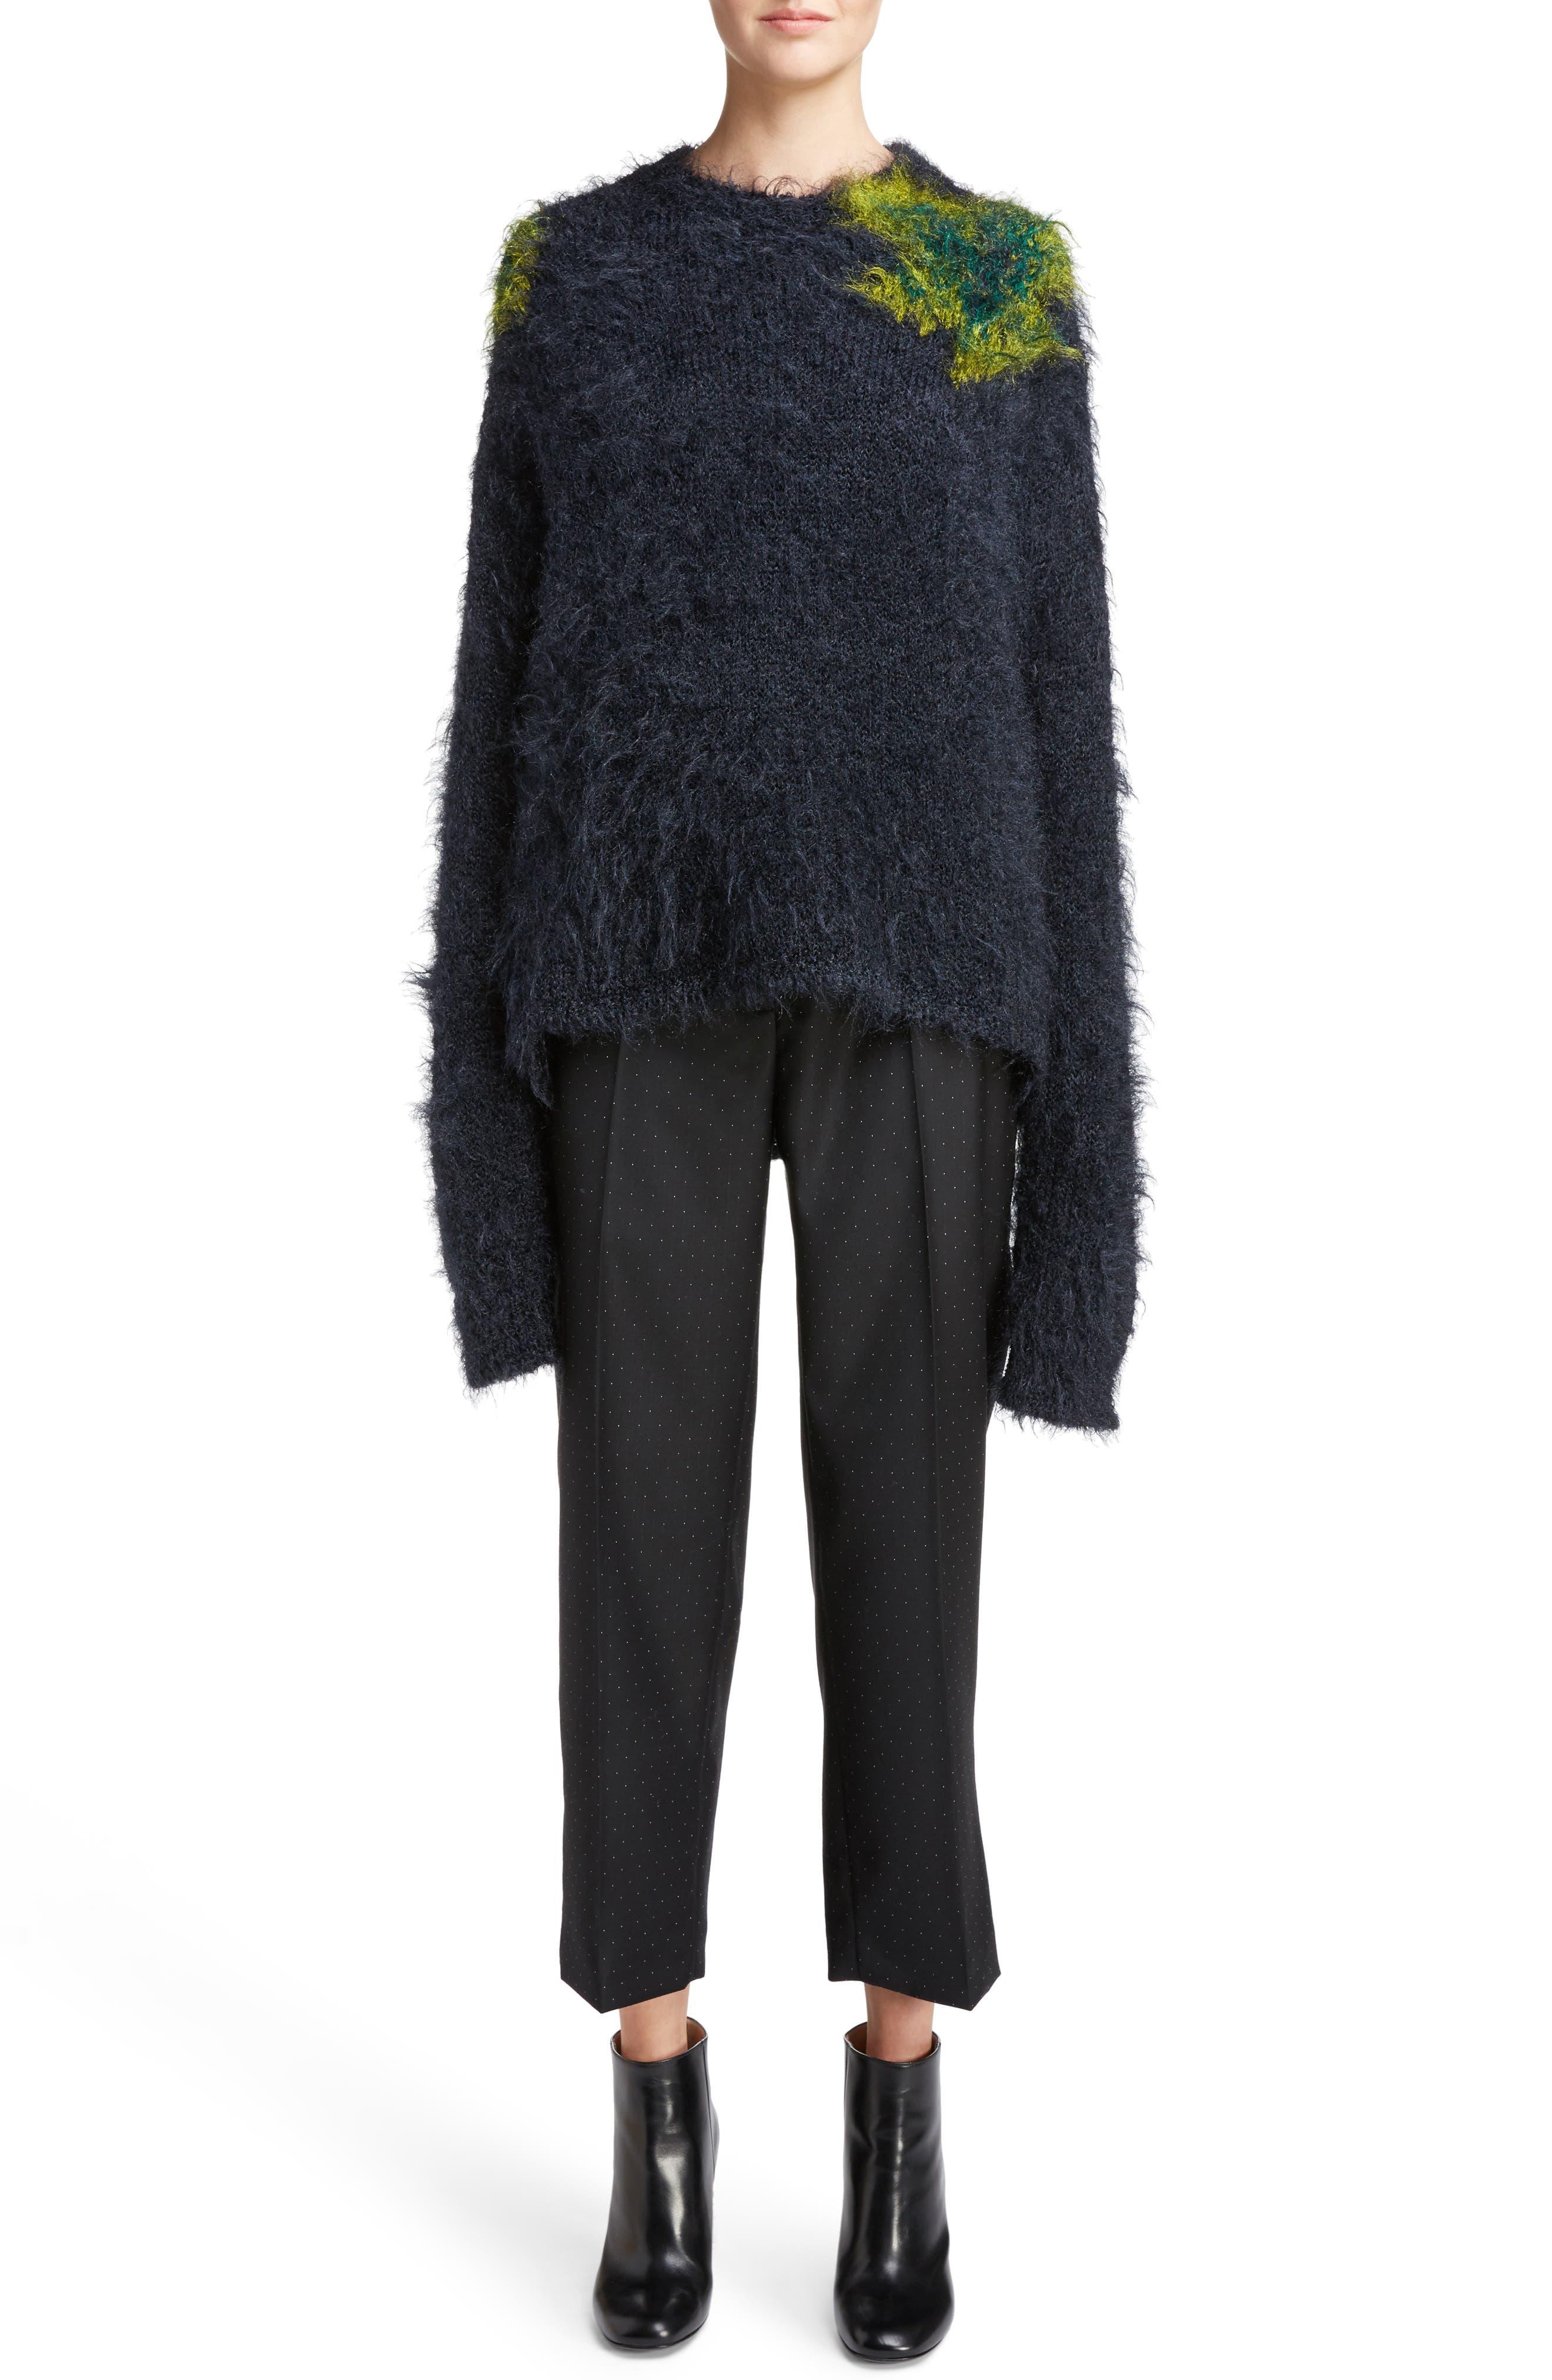 Alternate Image 1 Selected - ACNE Studios Fhira Hairy Oversize Sweater